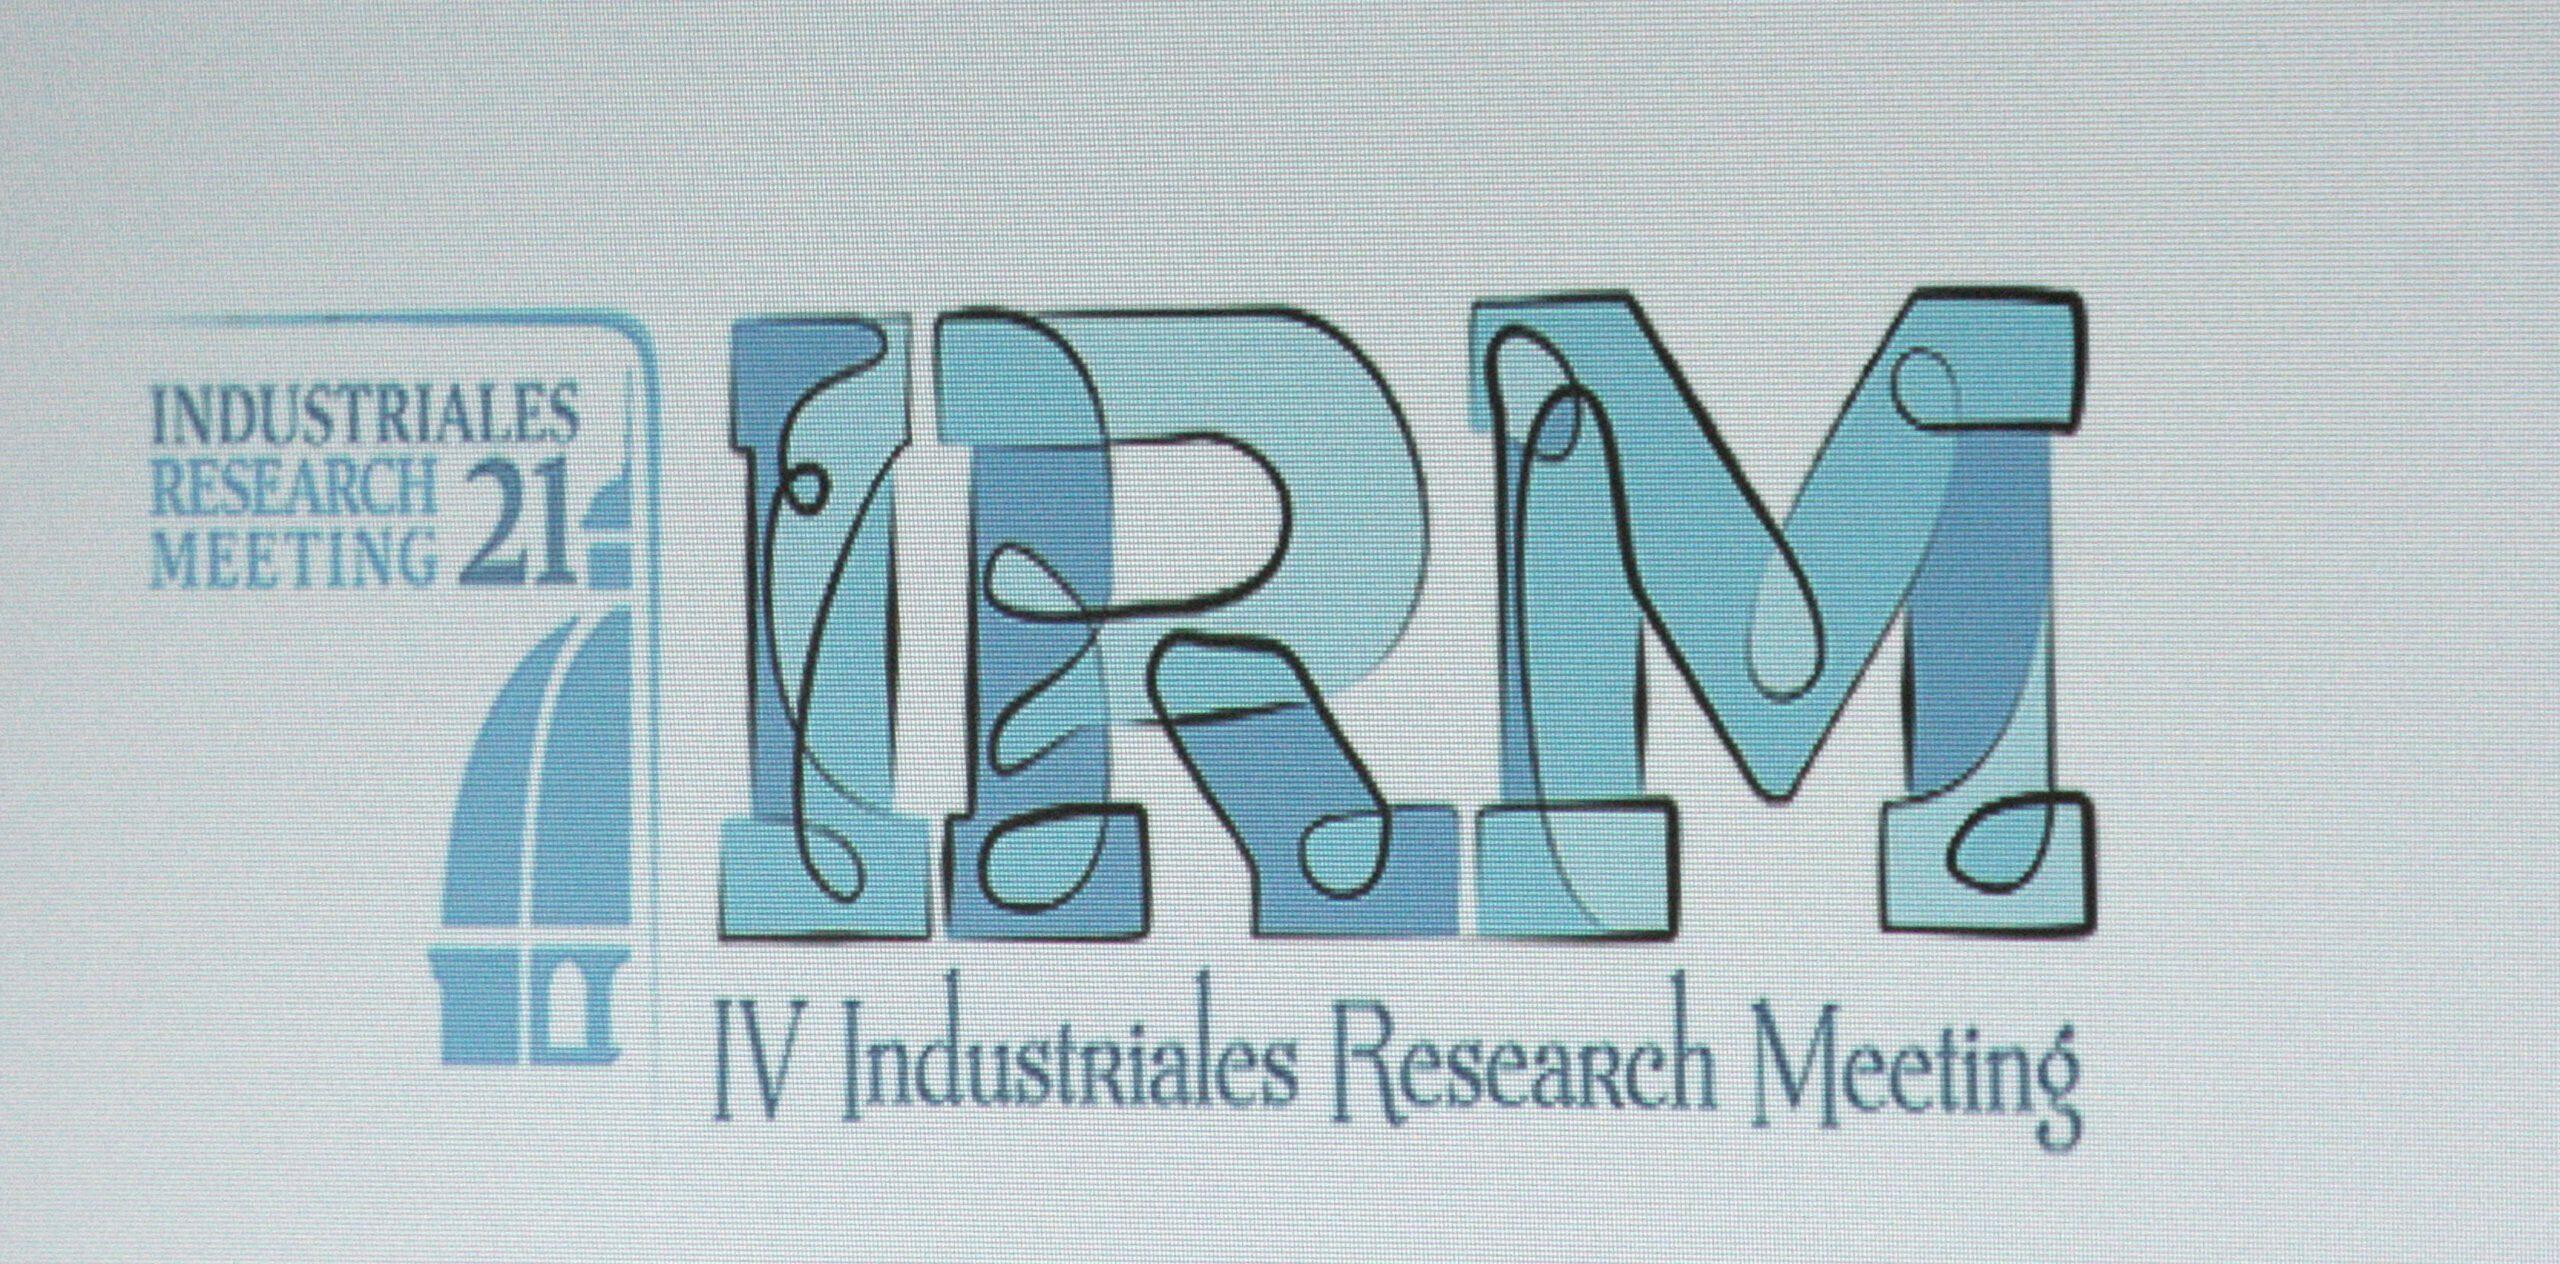 IRM 21 Industriales escuela